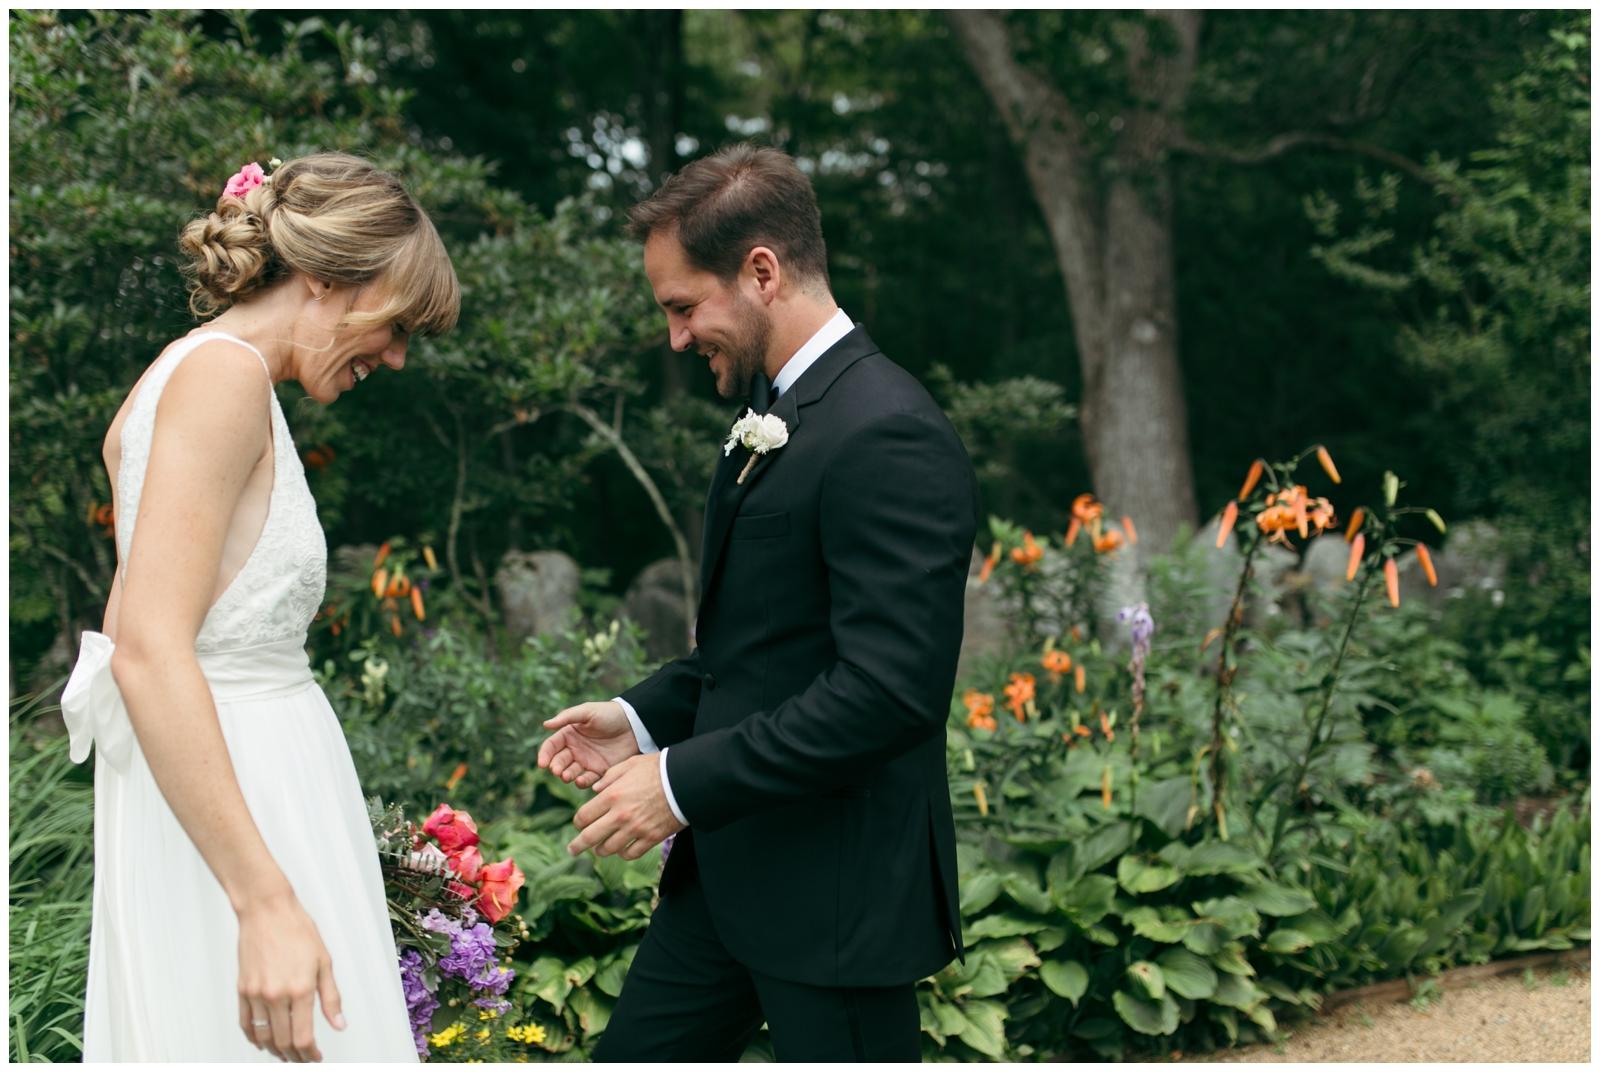 Moraine-Farm-wedding-Bailey-Q-Photo-Massachusetts-wedding-photpgrapher-019.jpg